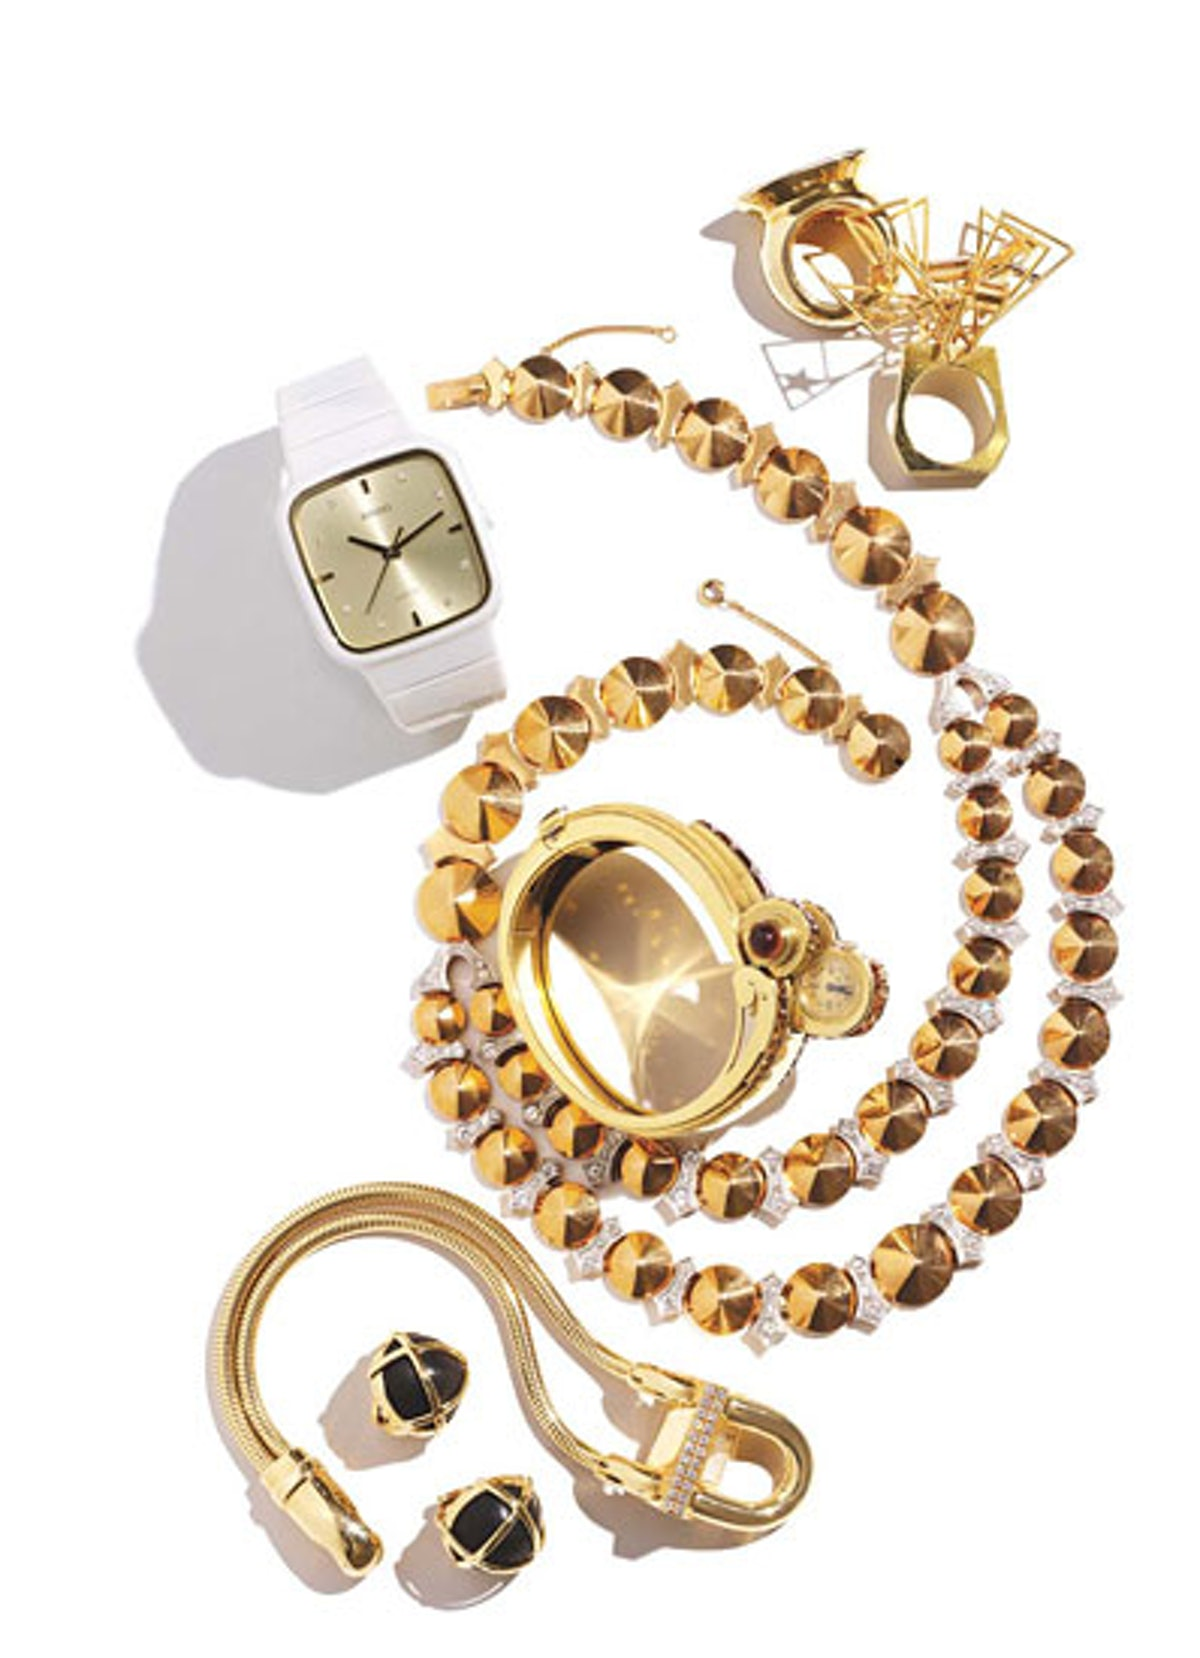 acss_gold_jewelry_v.jpg